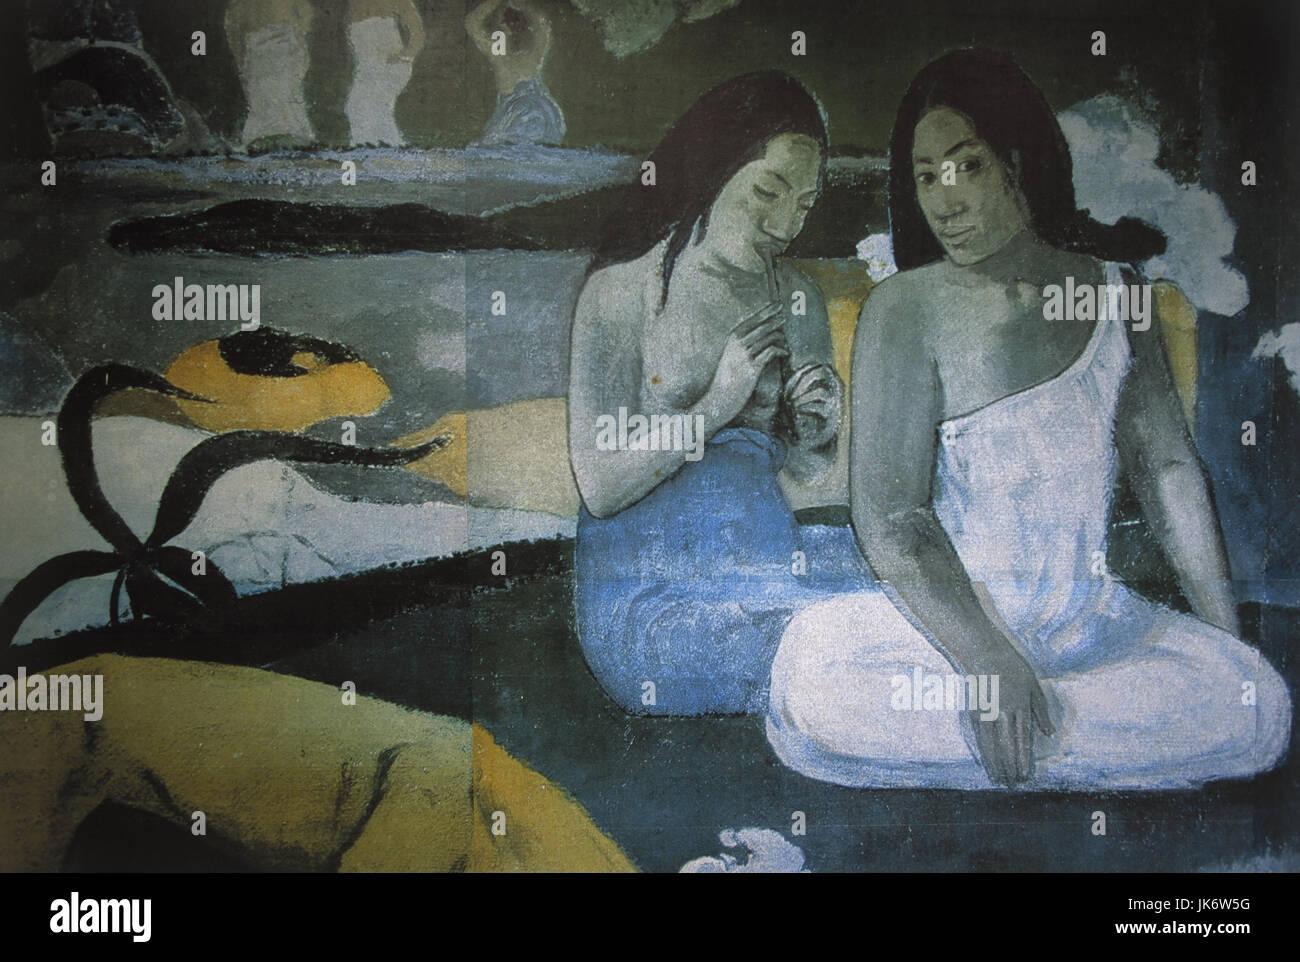 Französisch-Polynesien, Tahiti, Papeari,  Gauguin-Museum, Gemälde  Südsee, Ozeanien, Polynesien, - Stock Image